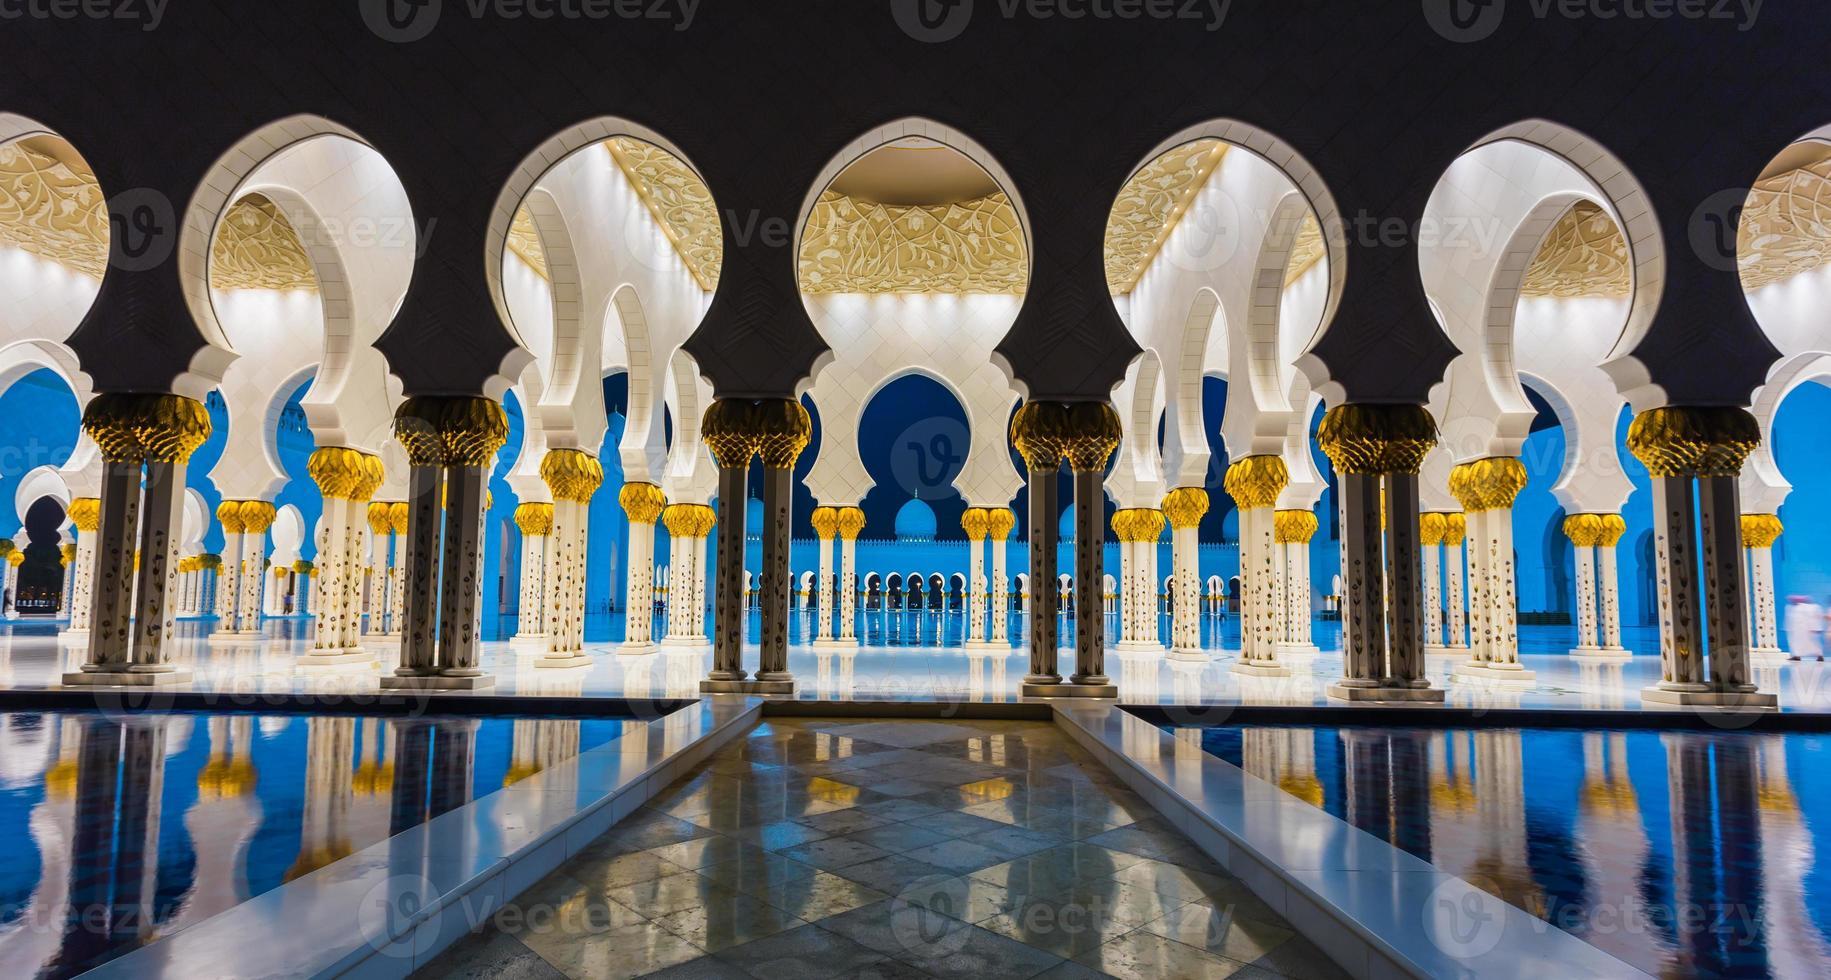 The Shaikh Zayed Mosque photo